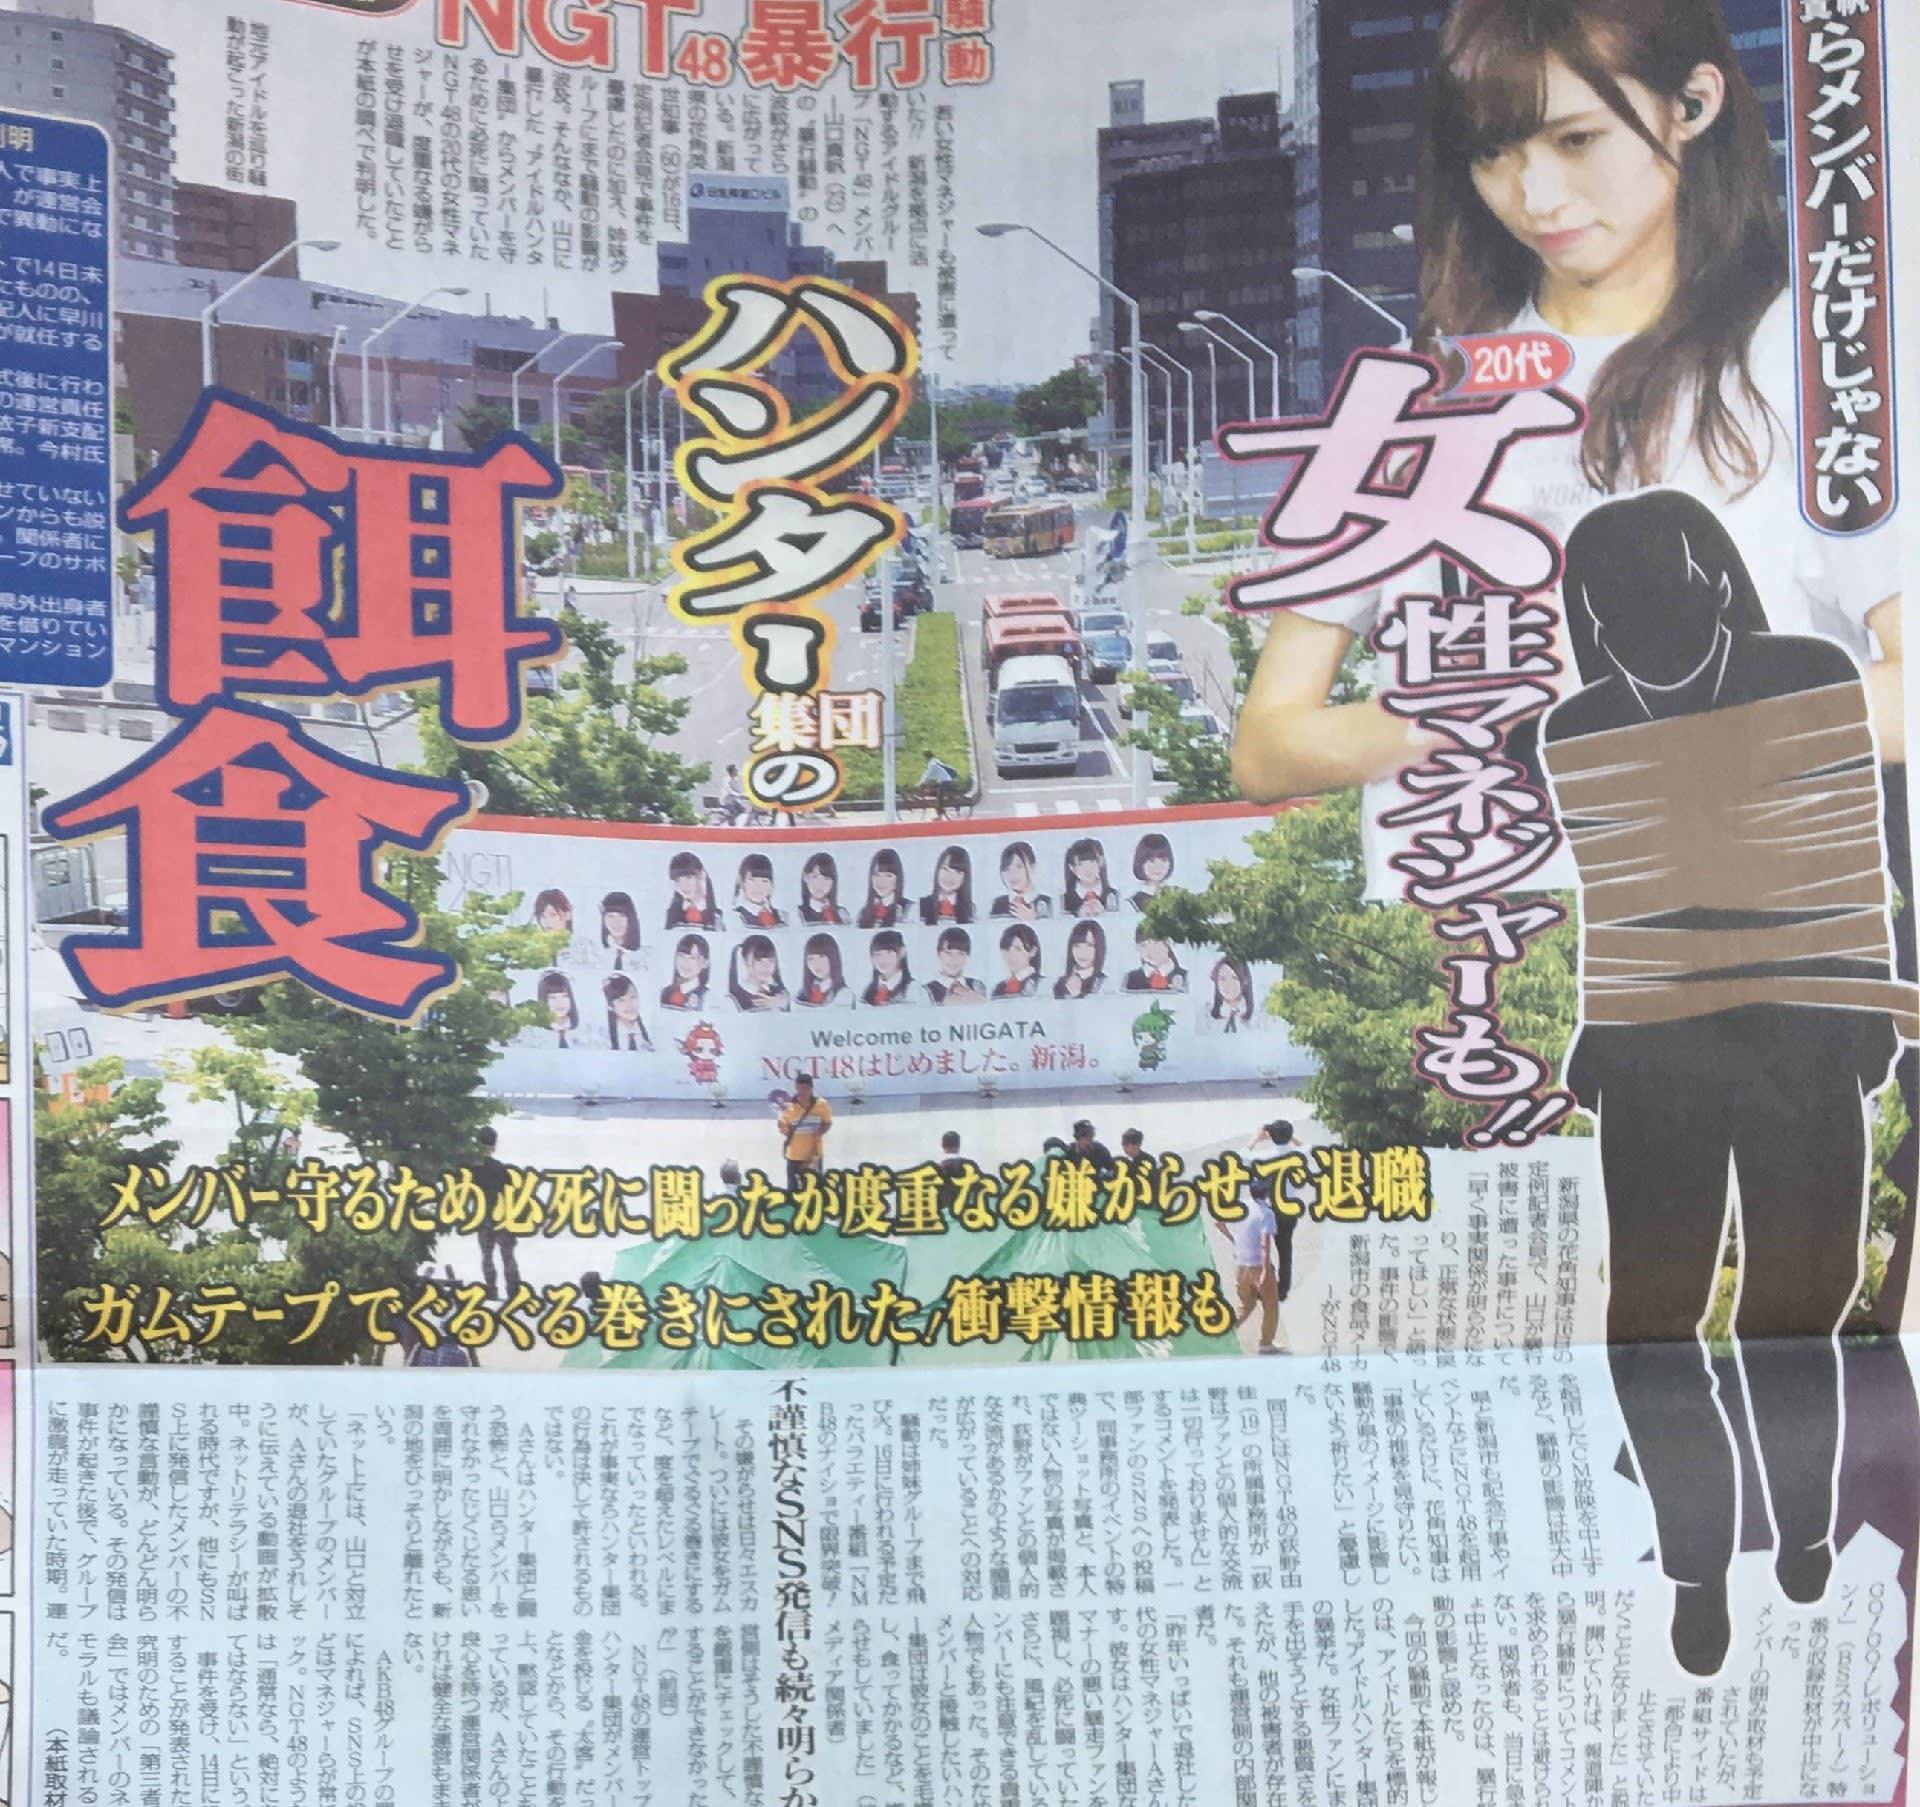 http://blogimg.goo.ne.jp/user_image/3d/65/ee16cac11a254628000c88e5a365a985.jpg